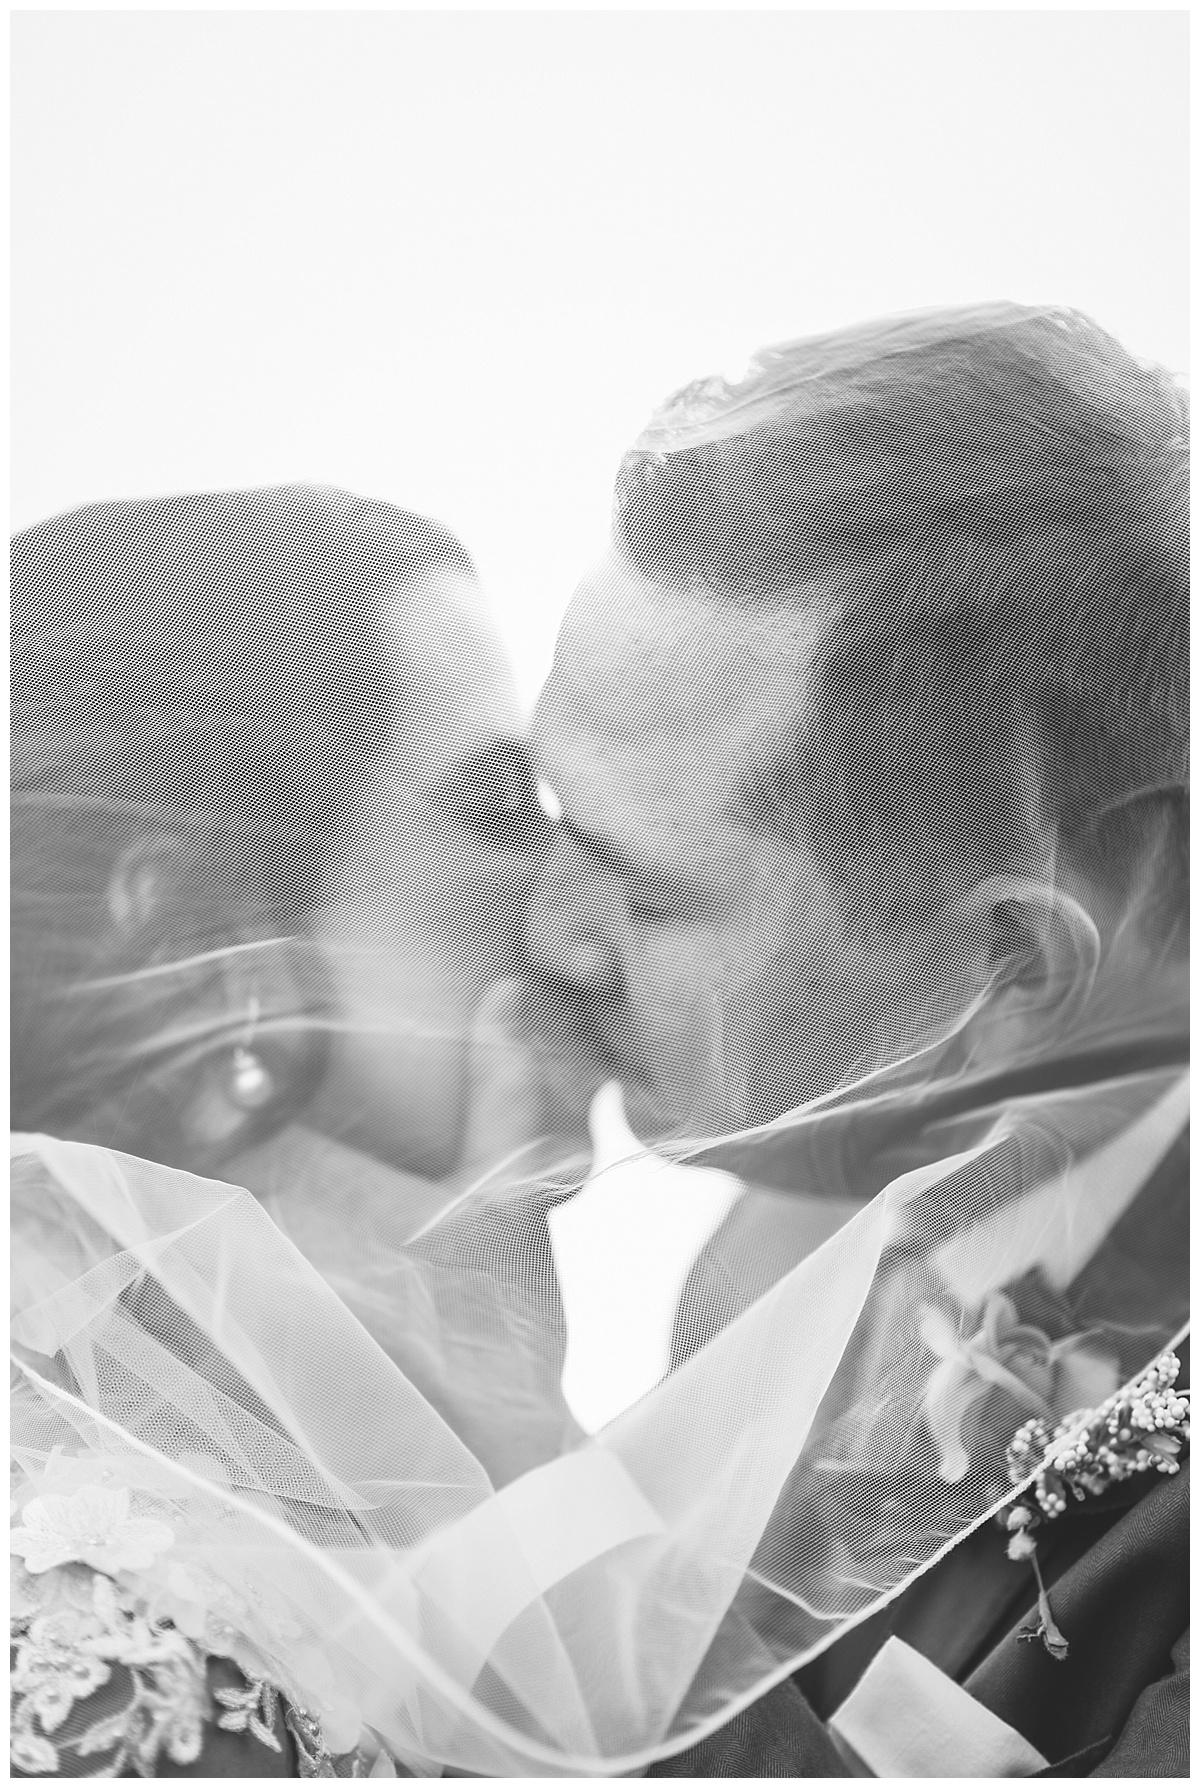 Wellshire Event Center Golf Course Wedding, Colorado Wedding Photographer, Denver Wedding Photographer, Wellshire Wedding, Denver Colorado Wedding Photographer, Downtown Denver Wedding Photographer, Small Colorado Wedding Photographer, Intimate Colorado Wedding Photographer, Golf course wedding dener